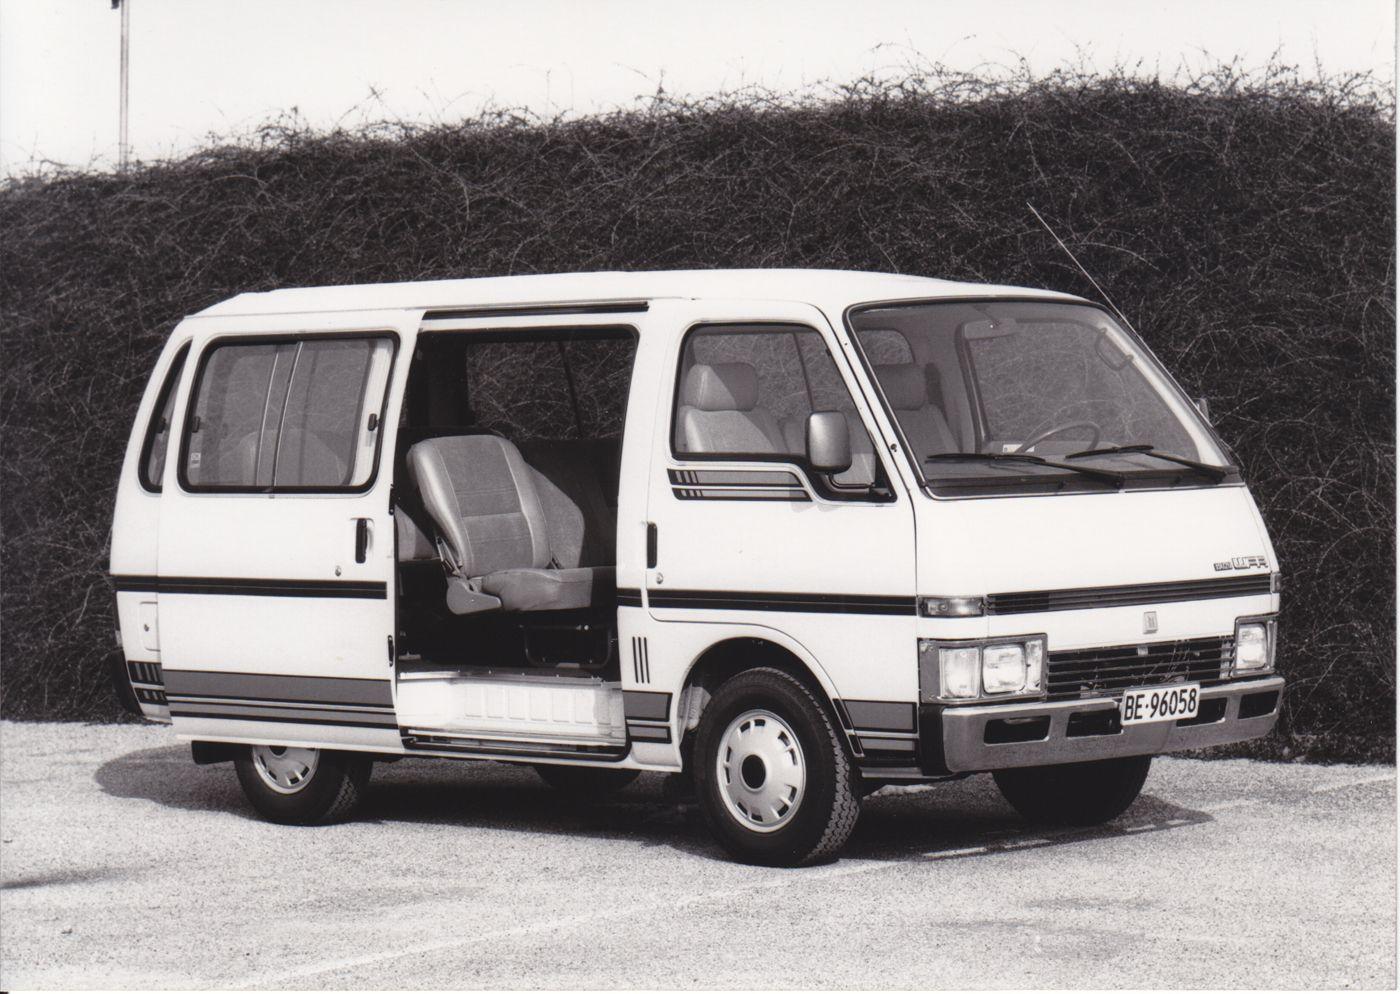 Isuzu Passenger Van Wfr Van Car Manufacturers Press Photo